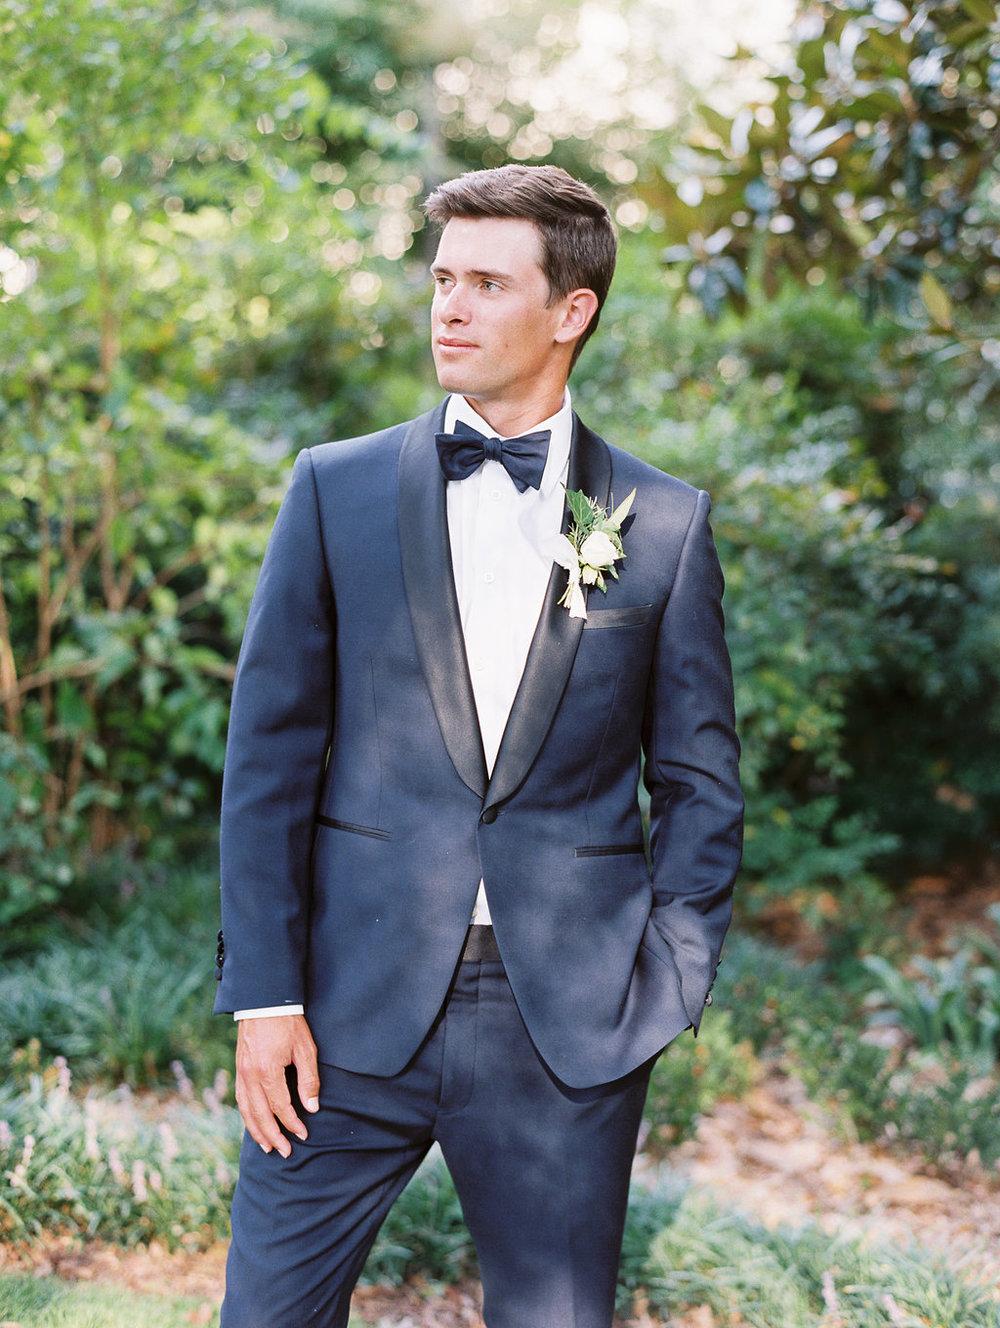 athens-founders-memorial-garden-wedding-photography-hannah-forsberg-atlanta-wedding-photographer-13.jpg